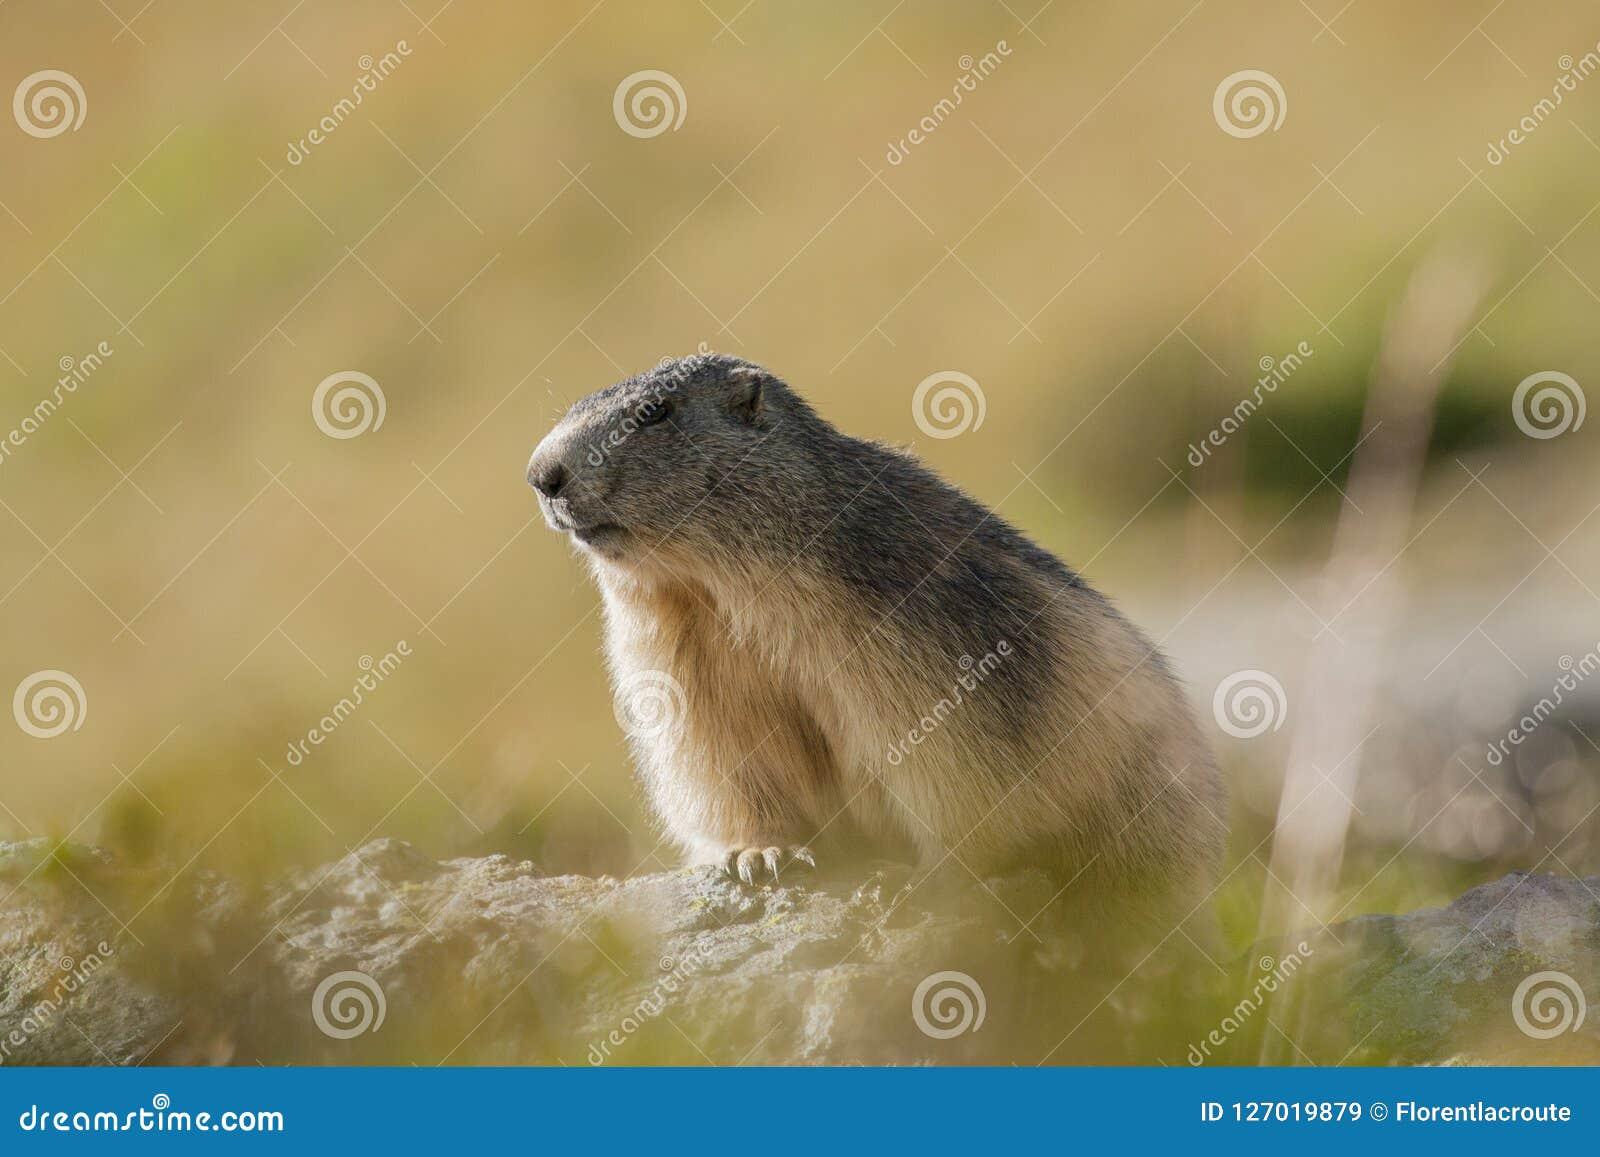 Backlit Marmot Portait In The French Alps, Marmota Marmota, Vanoise